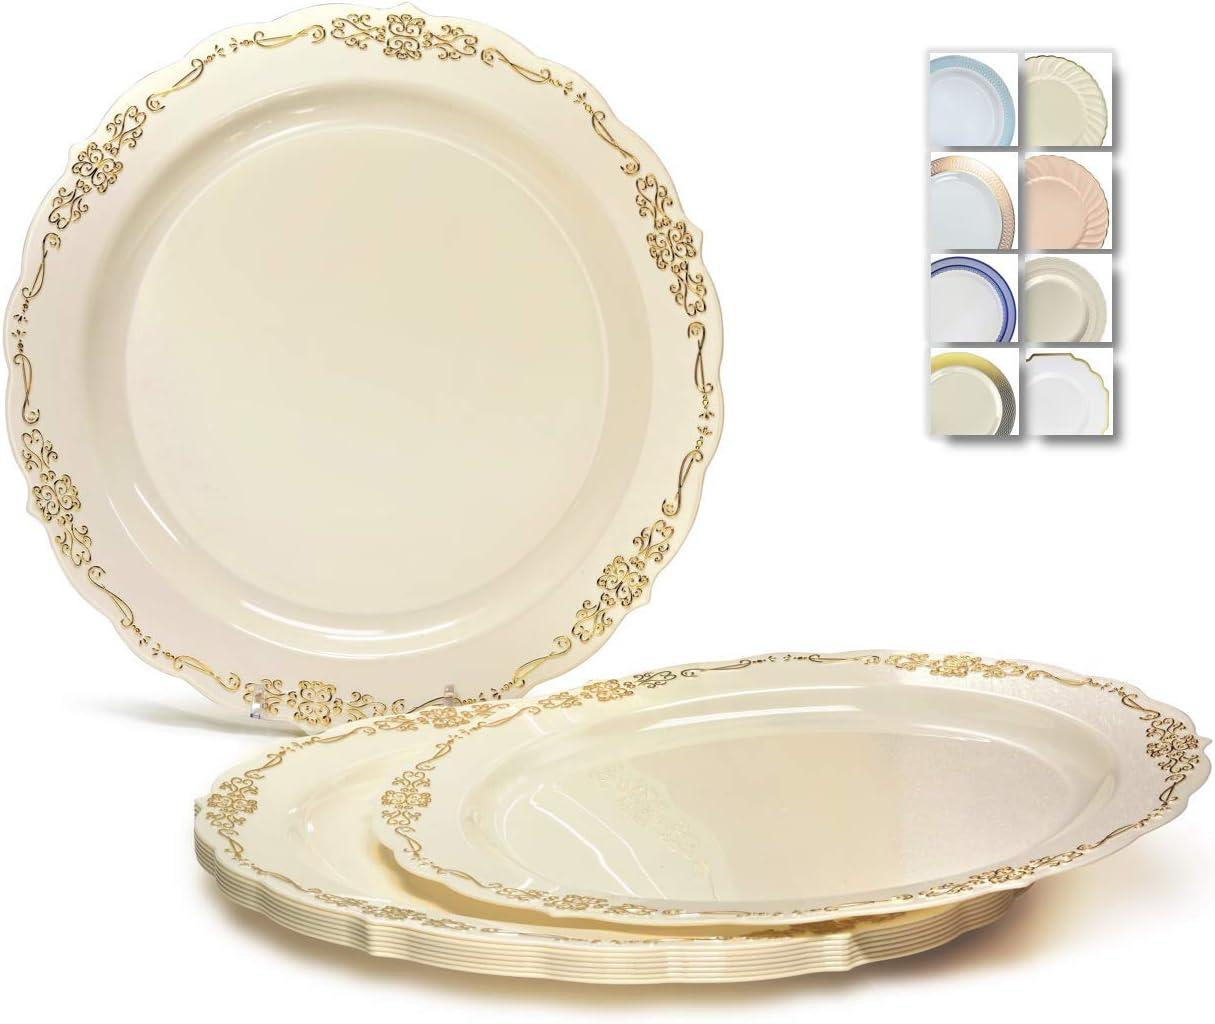 OCCASIONS 120 Plates Pack, Disposable Wedding Party Plastic Plates (7.5'' Appetizer/Dessert Plate, Verona Ivory & Gold) 61RFZOjZ3AL